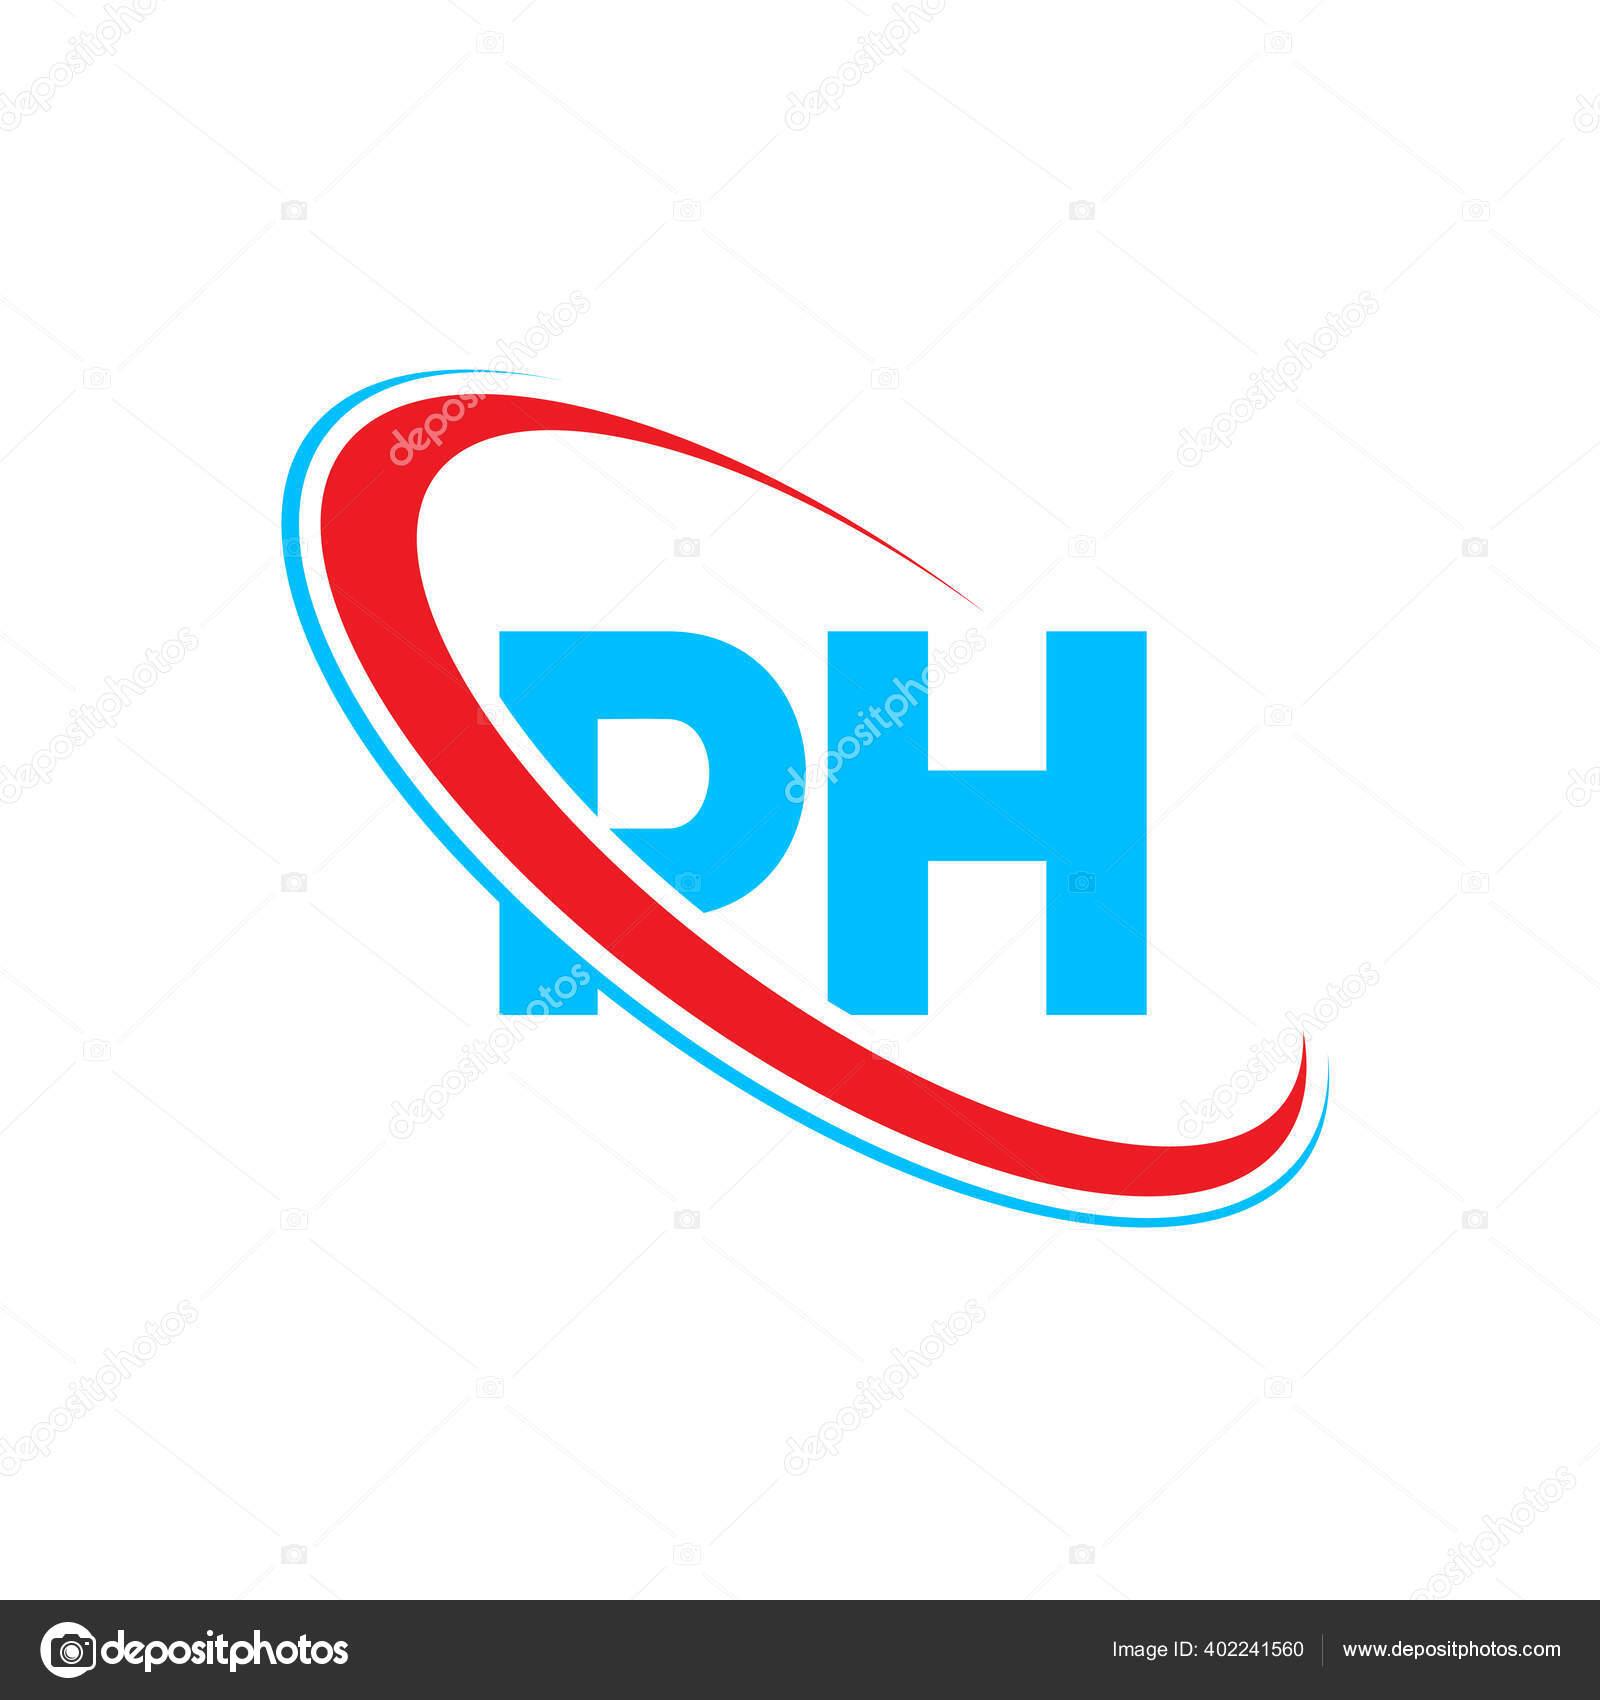 Desain Logo Huruf Huruf Awal Menghubungkan Lingkaran Atas Logo Monogram Stok Vektor C Mamuntwofiveg 402241560